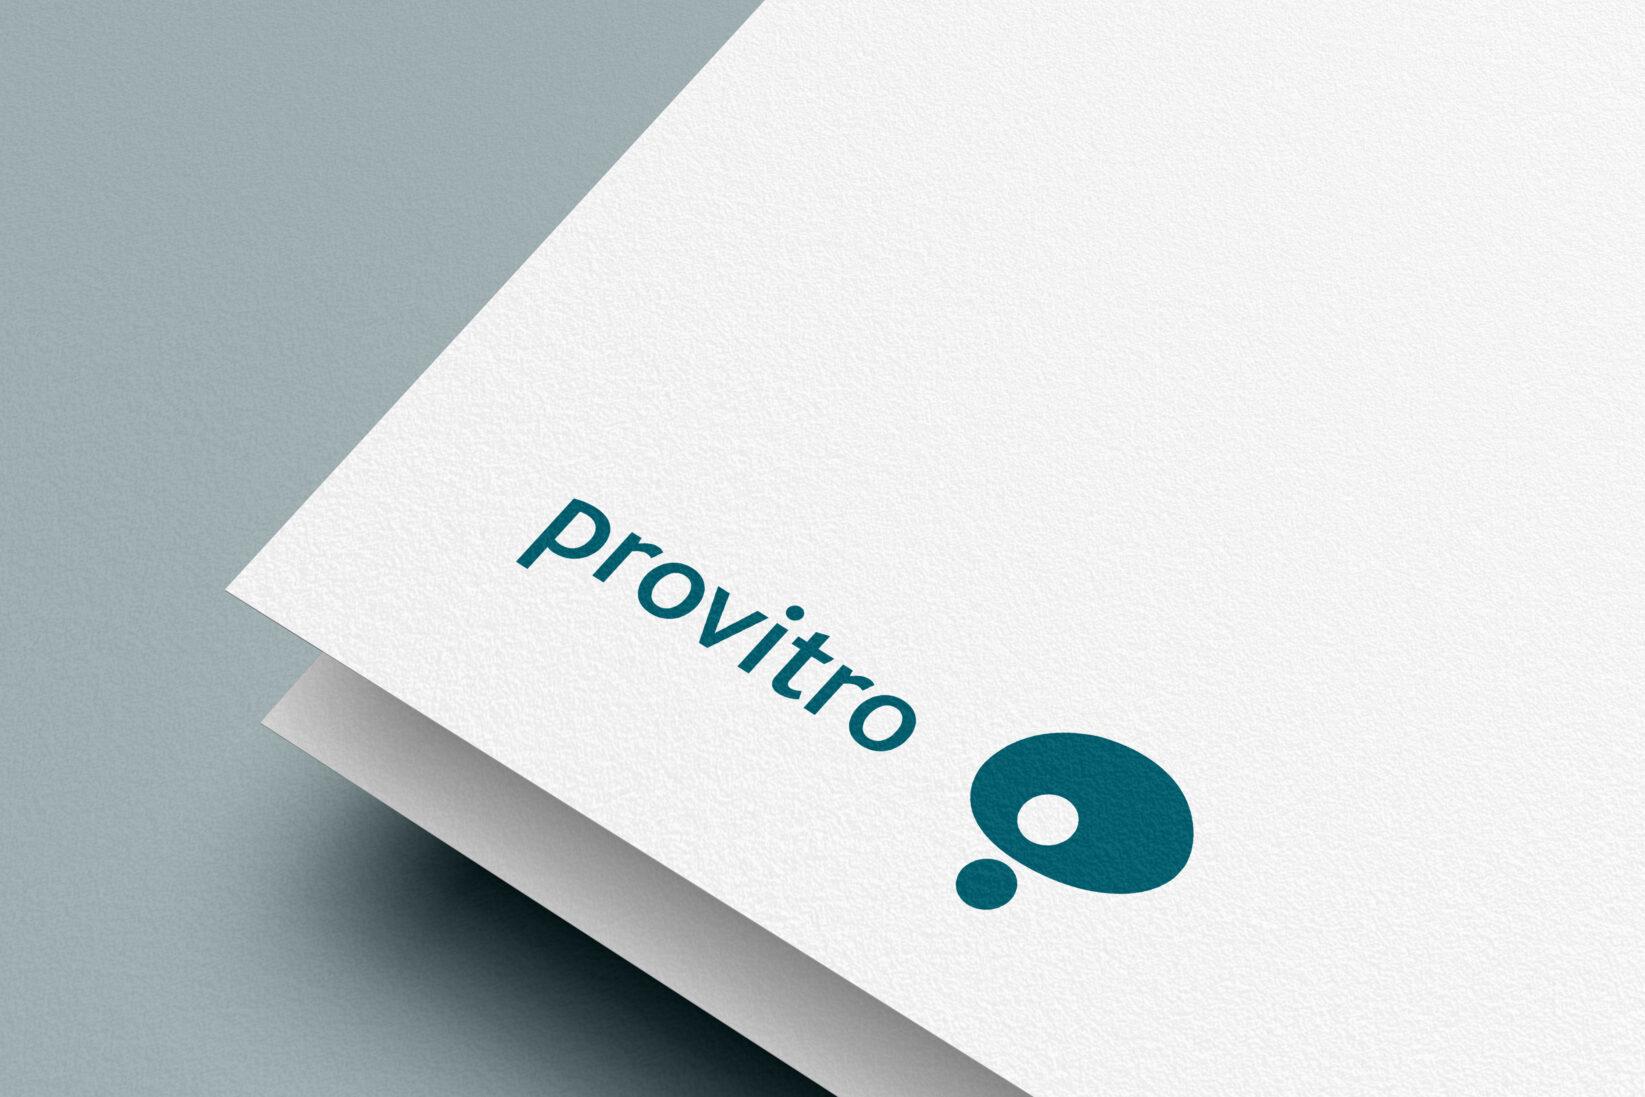 provitro Corporate Design Logo Detail